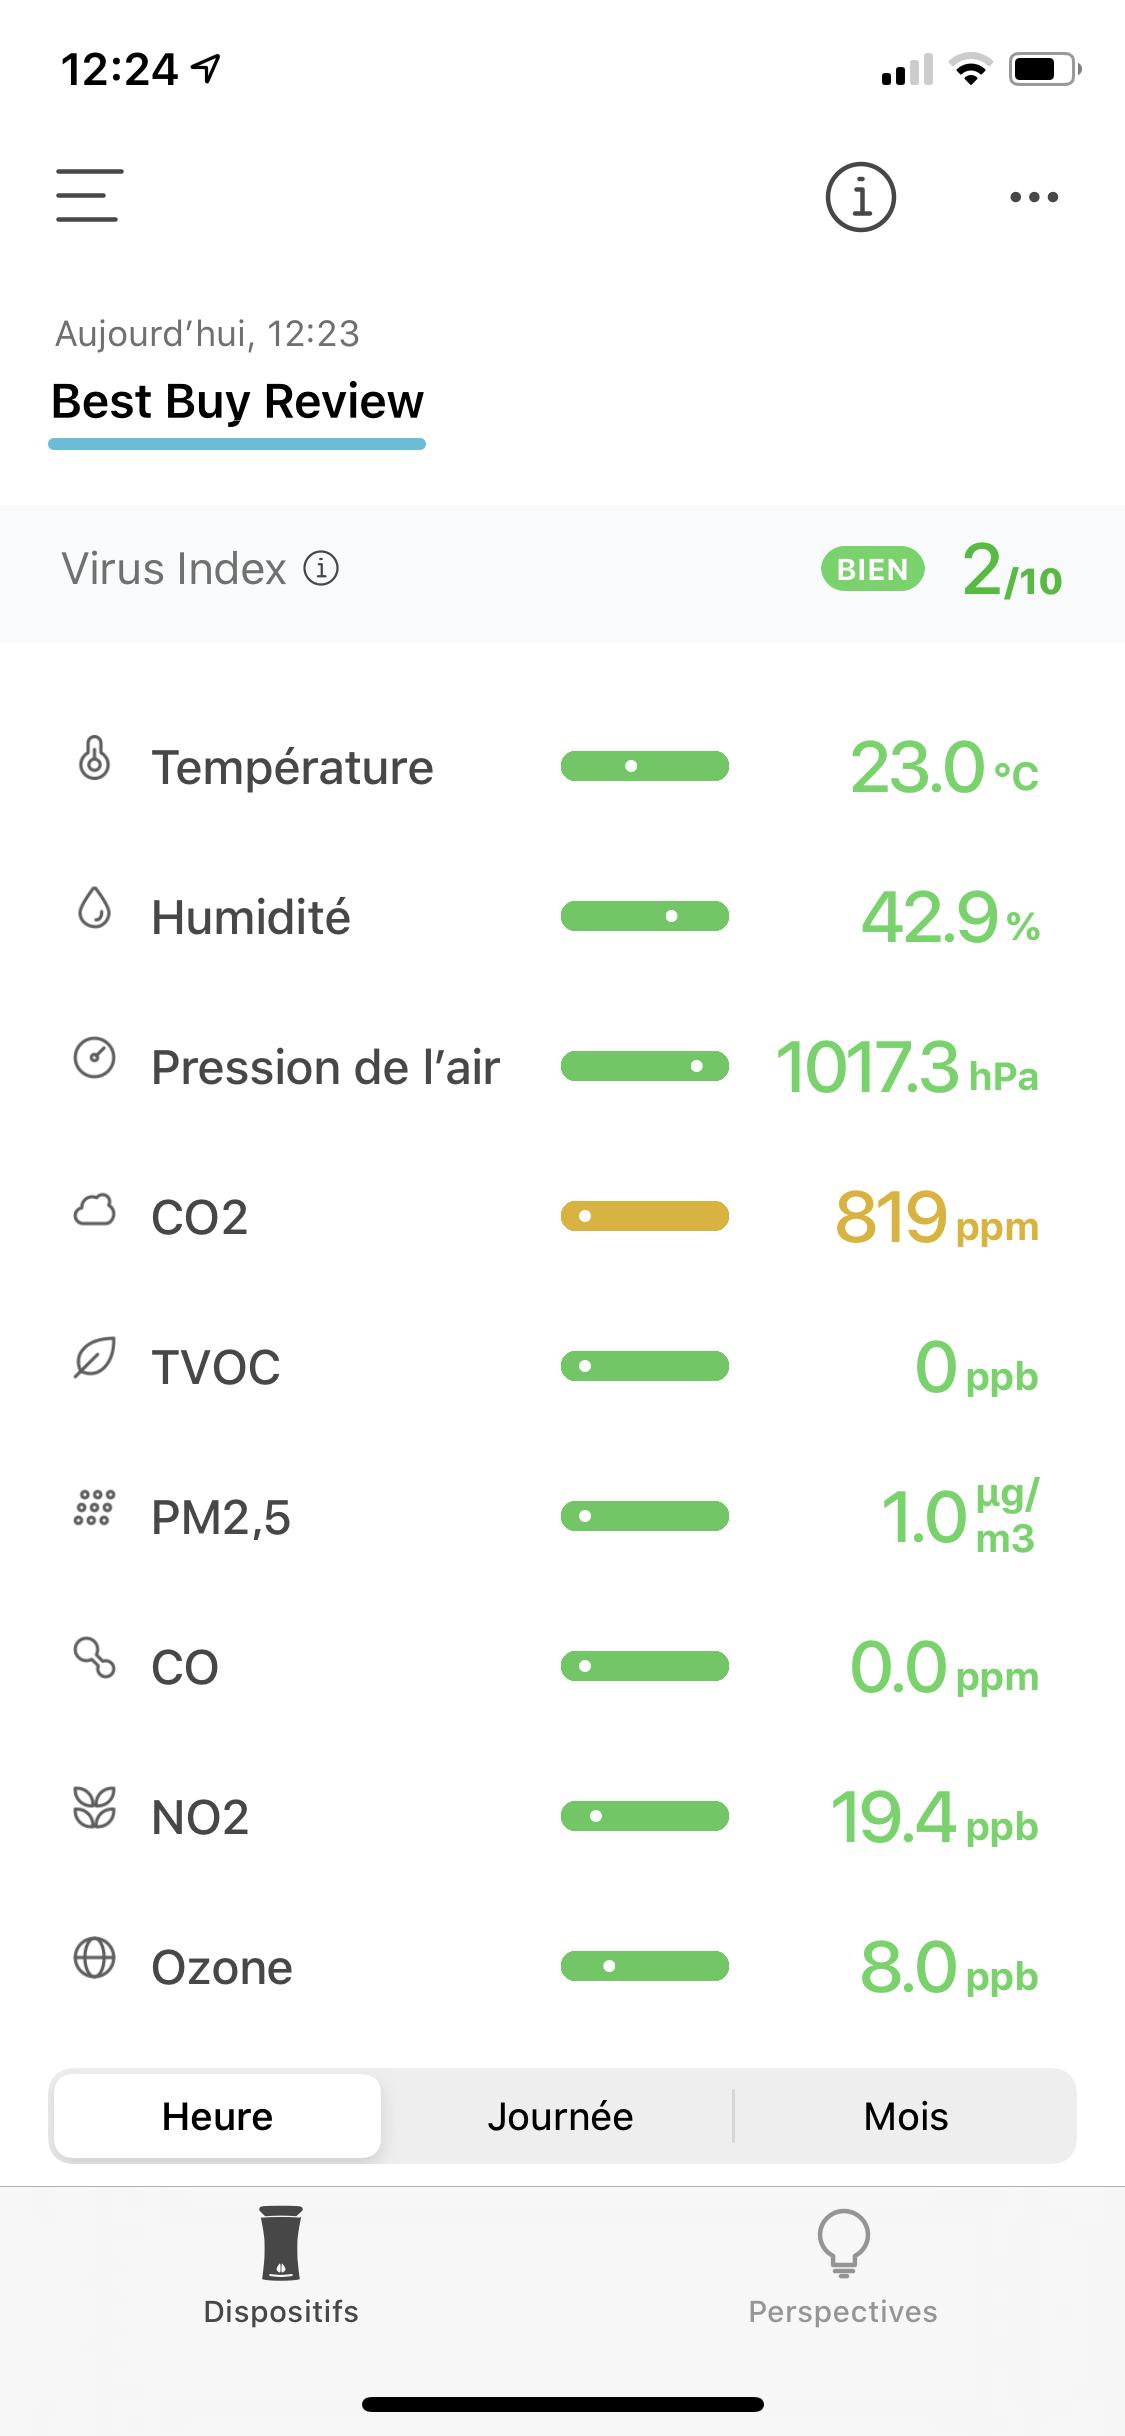 Image of uHoo application on iOS